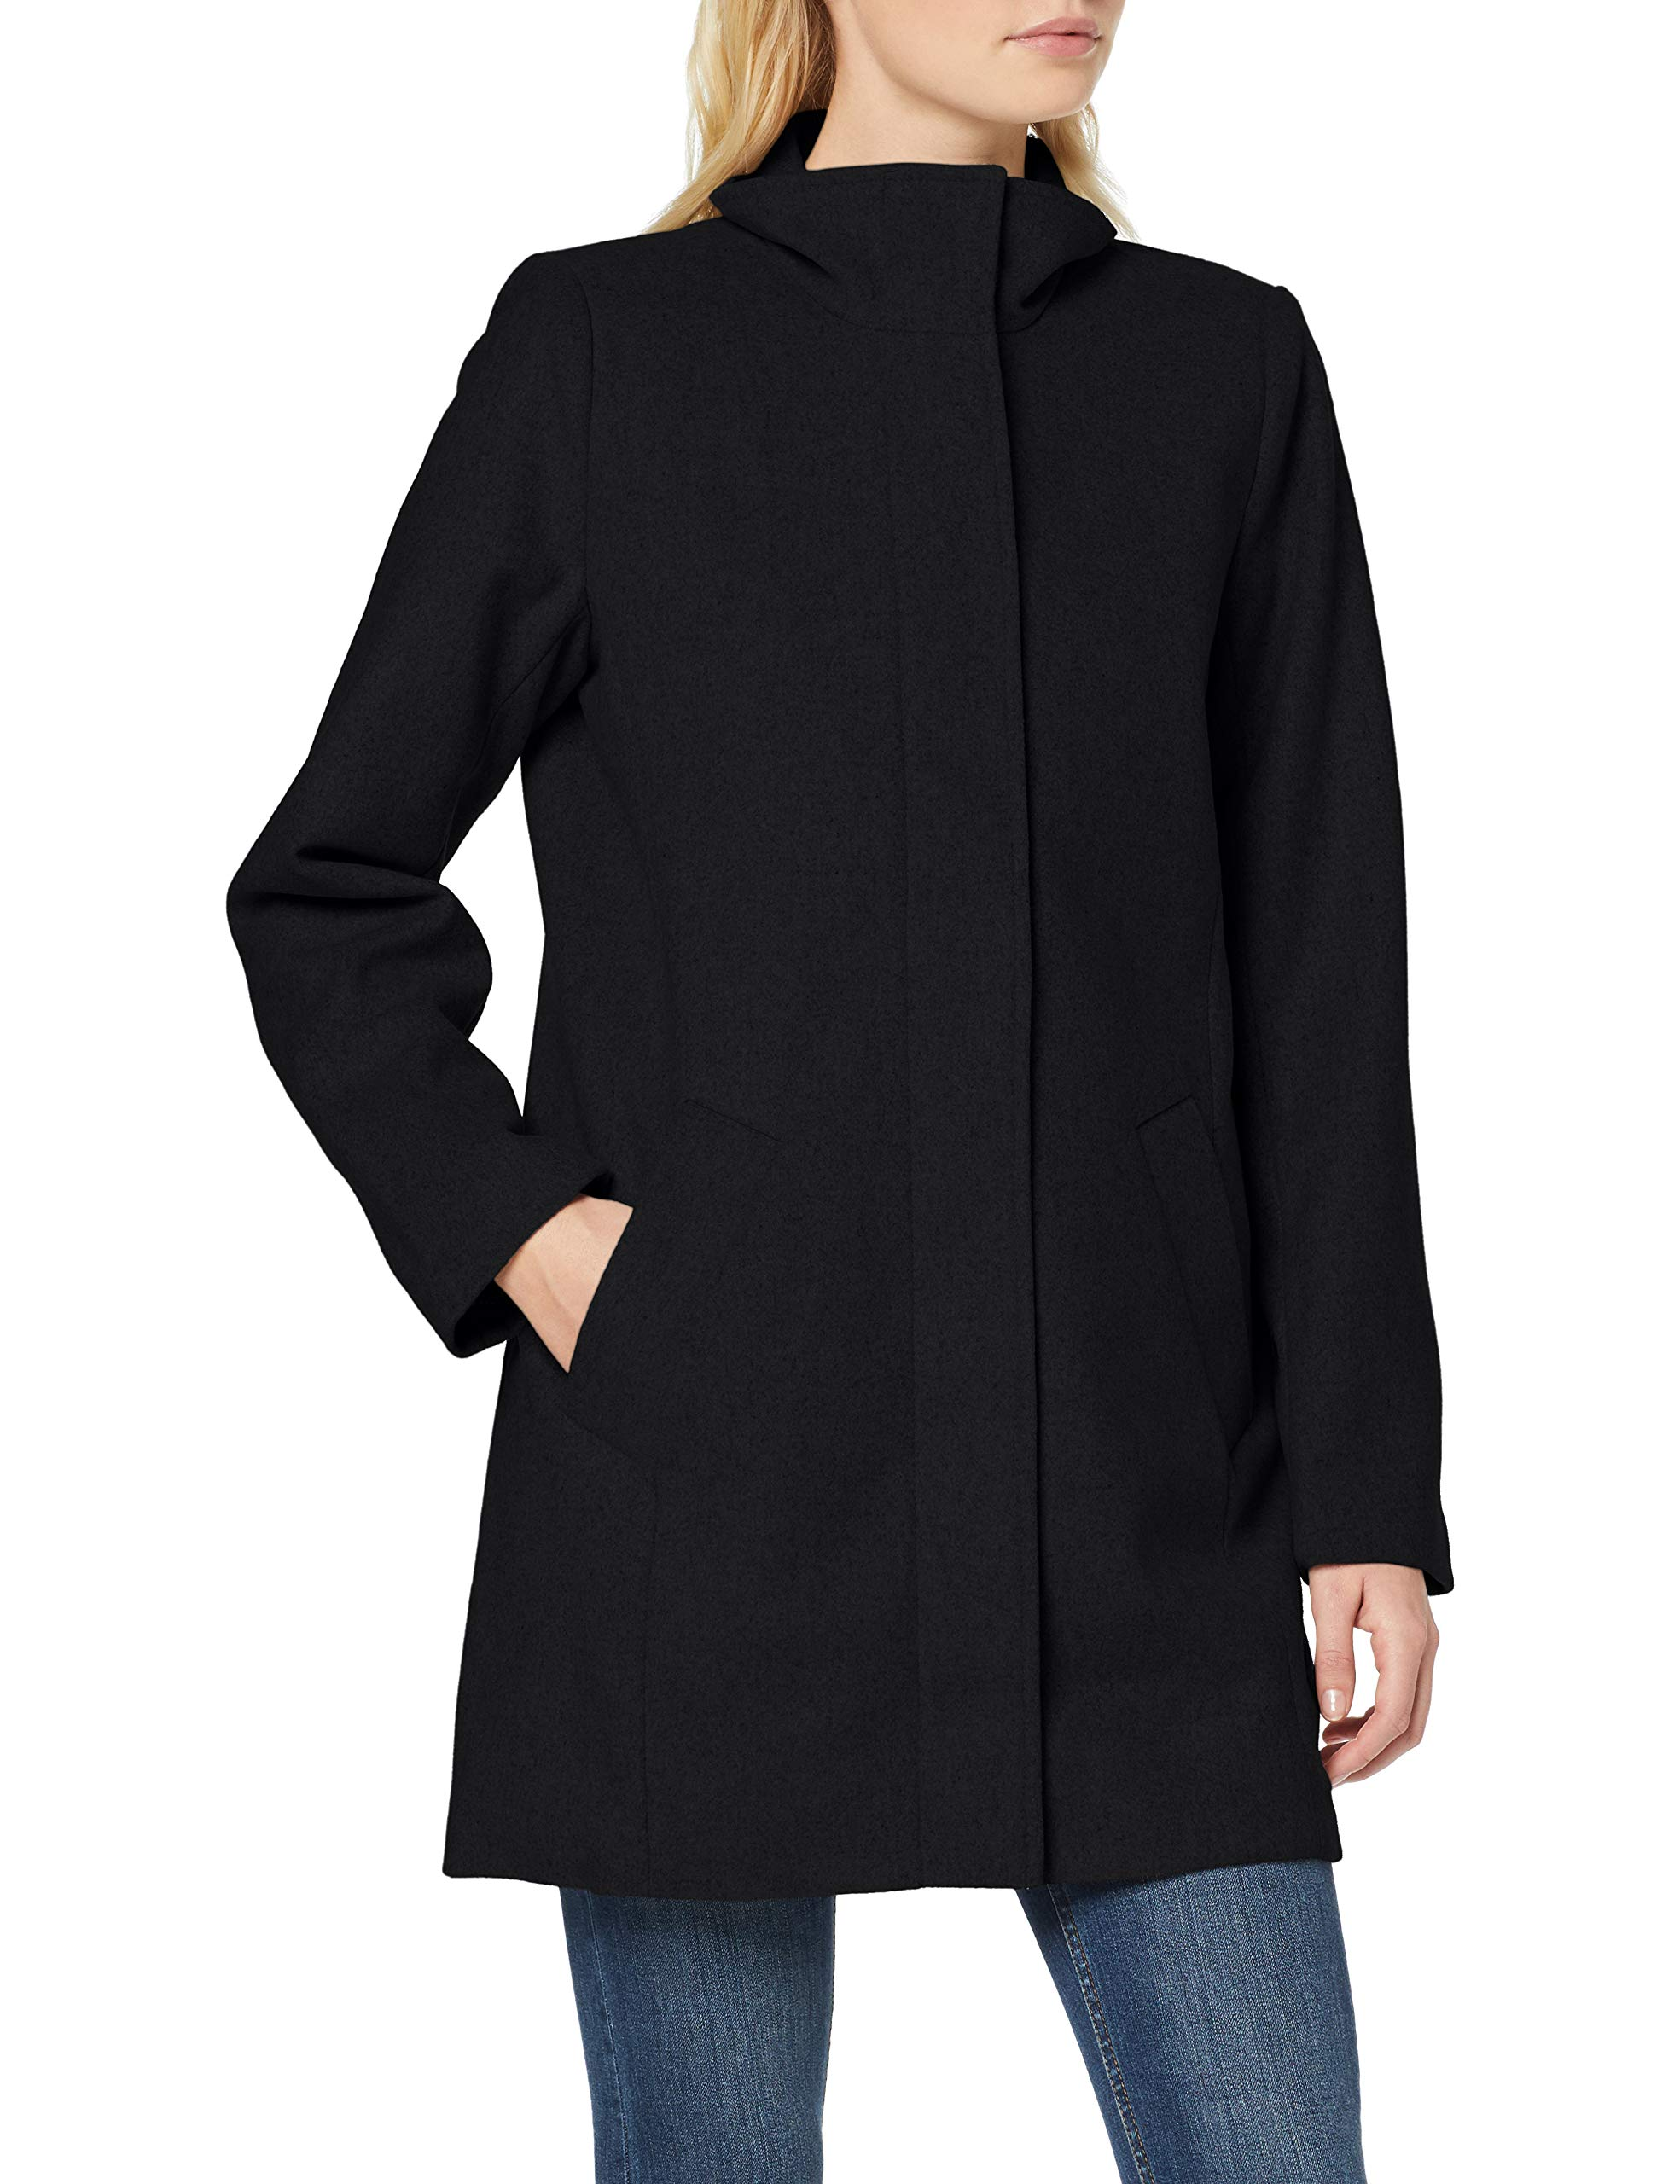 Fabricant36Femme Objsasha Nos Object Nora ManteauNoir Coat Noos Black38taille UzMVqSpG